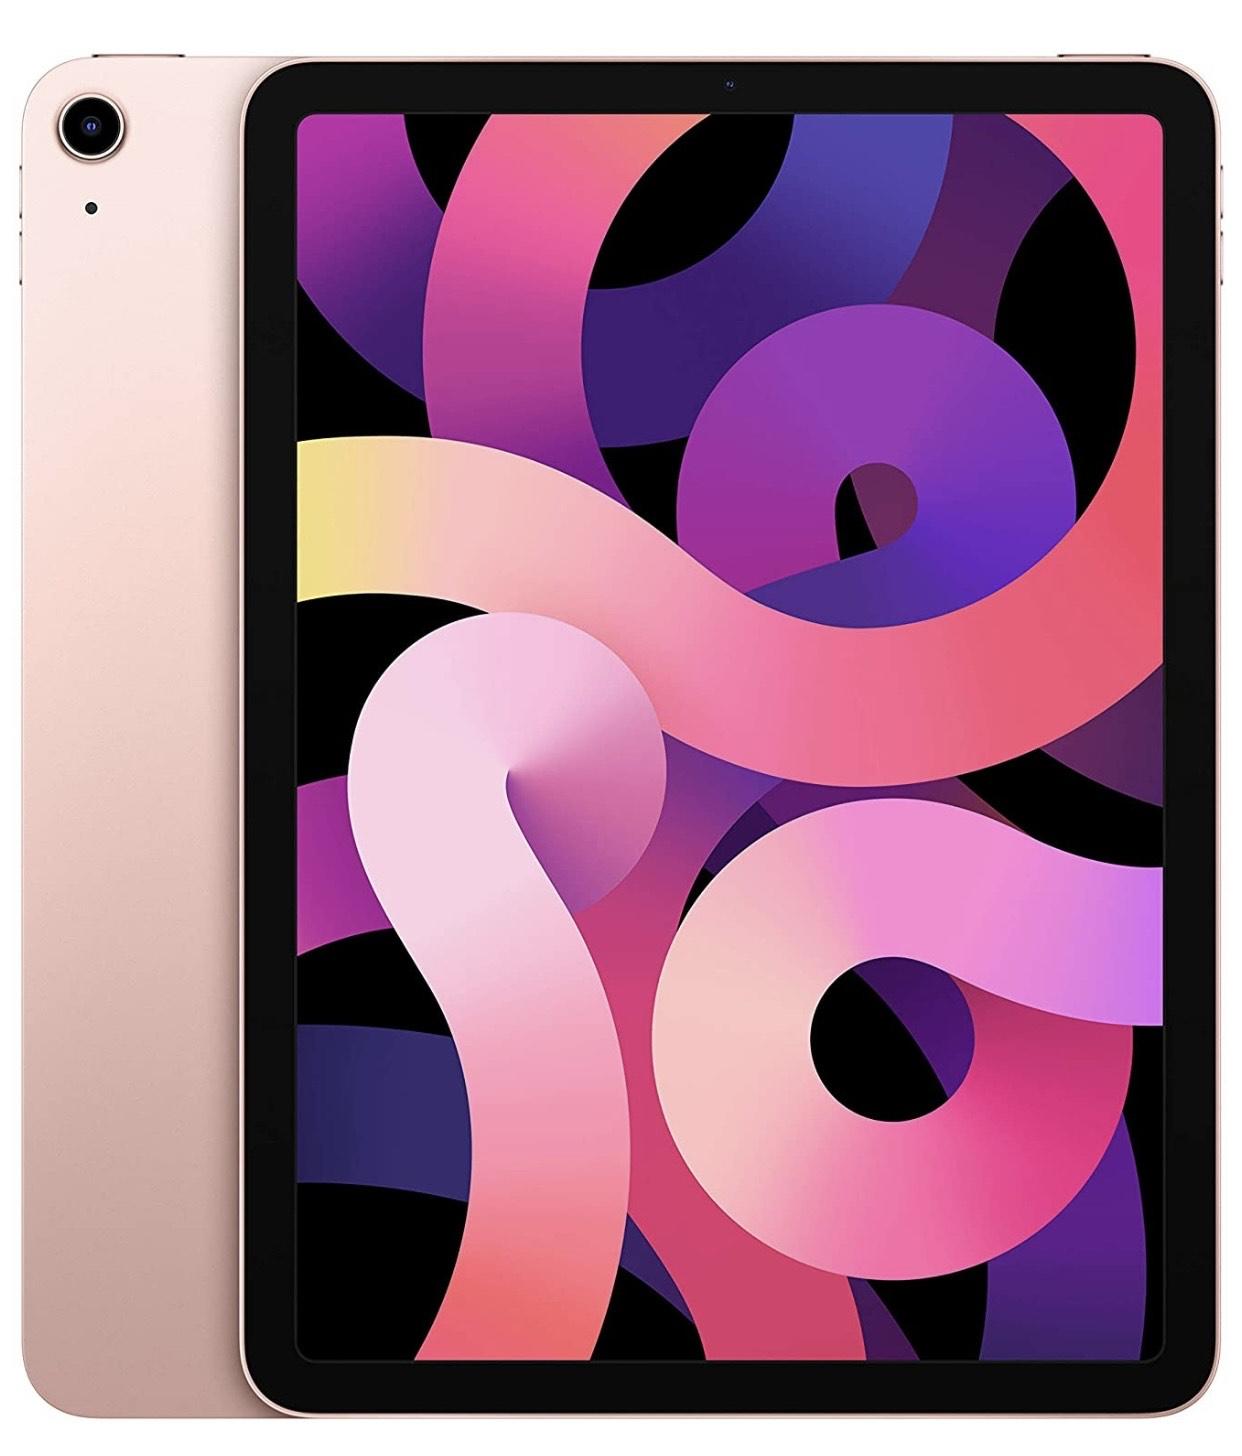 New Apple iPad Air (10.9-inch, Wi-Fi, 256GB) - Rose Gold (Latest Model, 4th Generation) @ Amazon